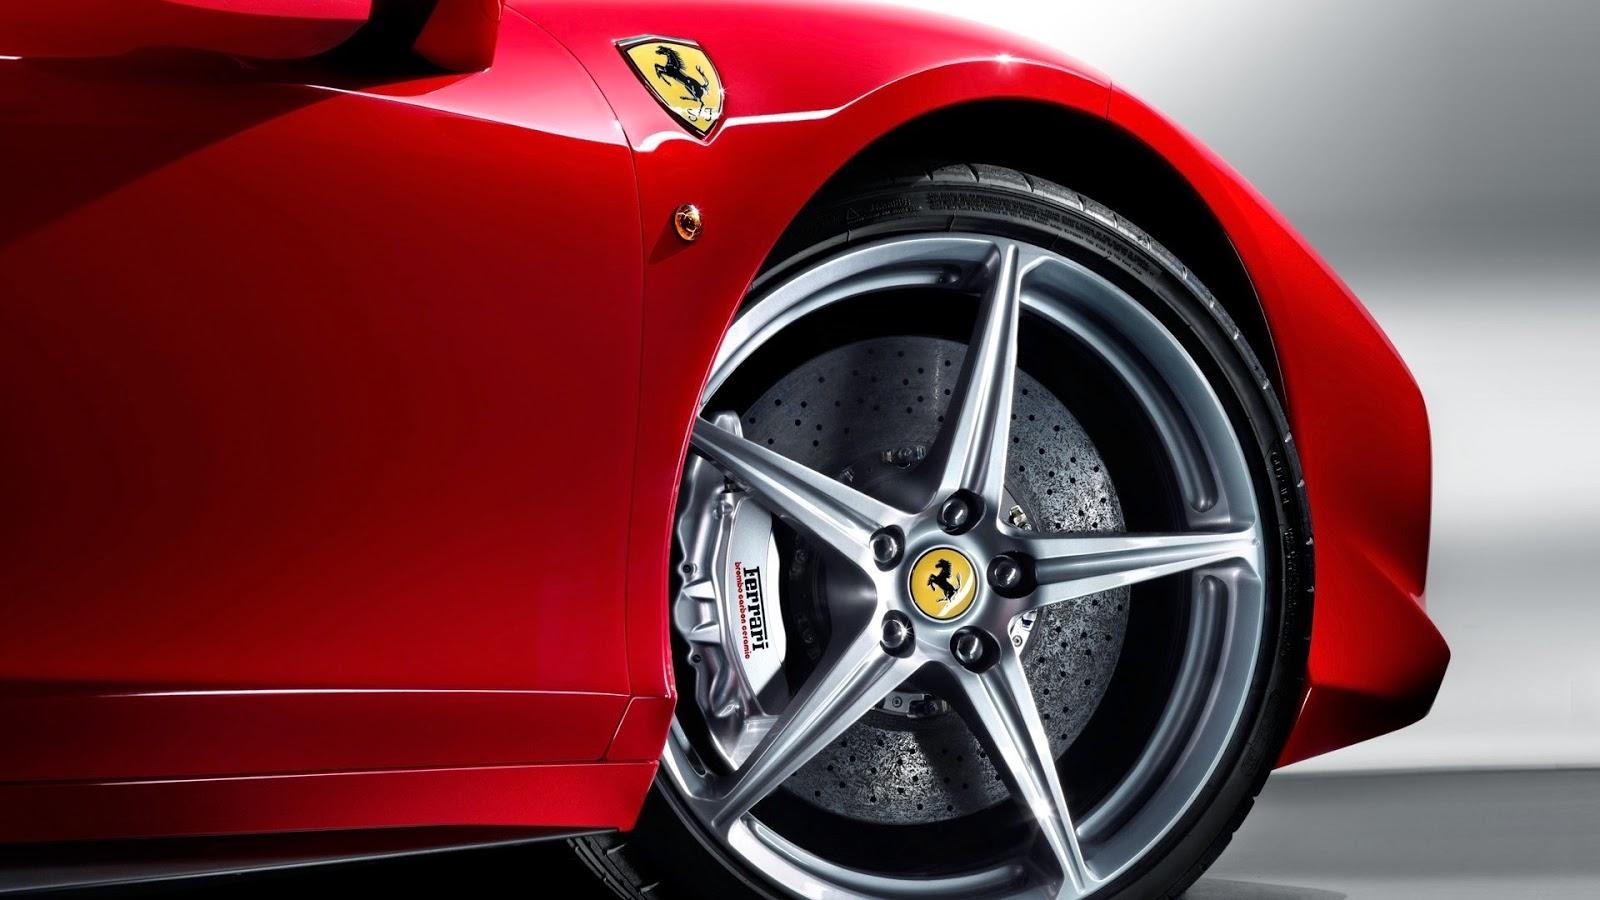 Imagenes De Autos Modificados: Fondo De Pantalla De Autos